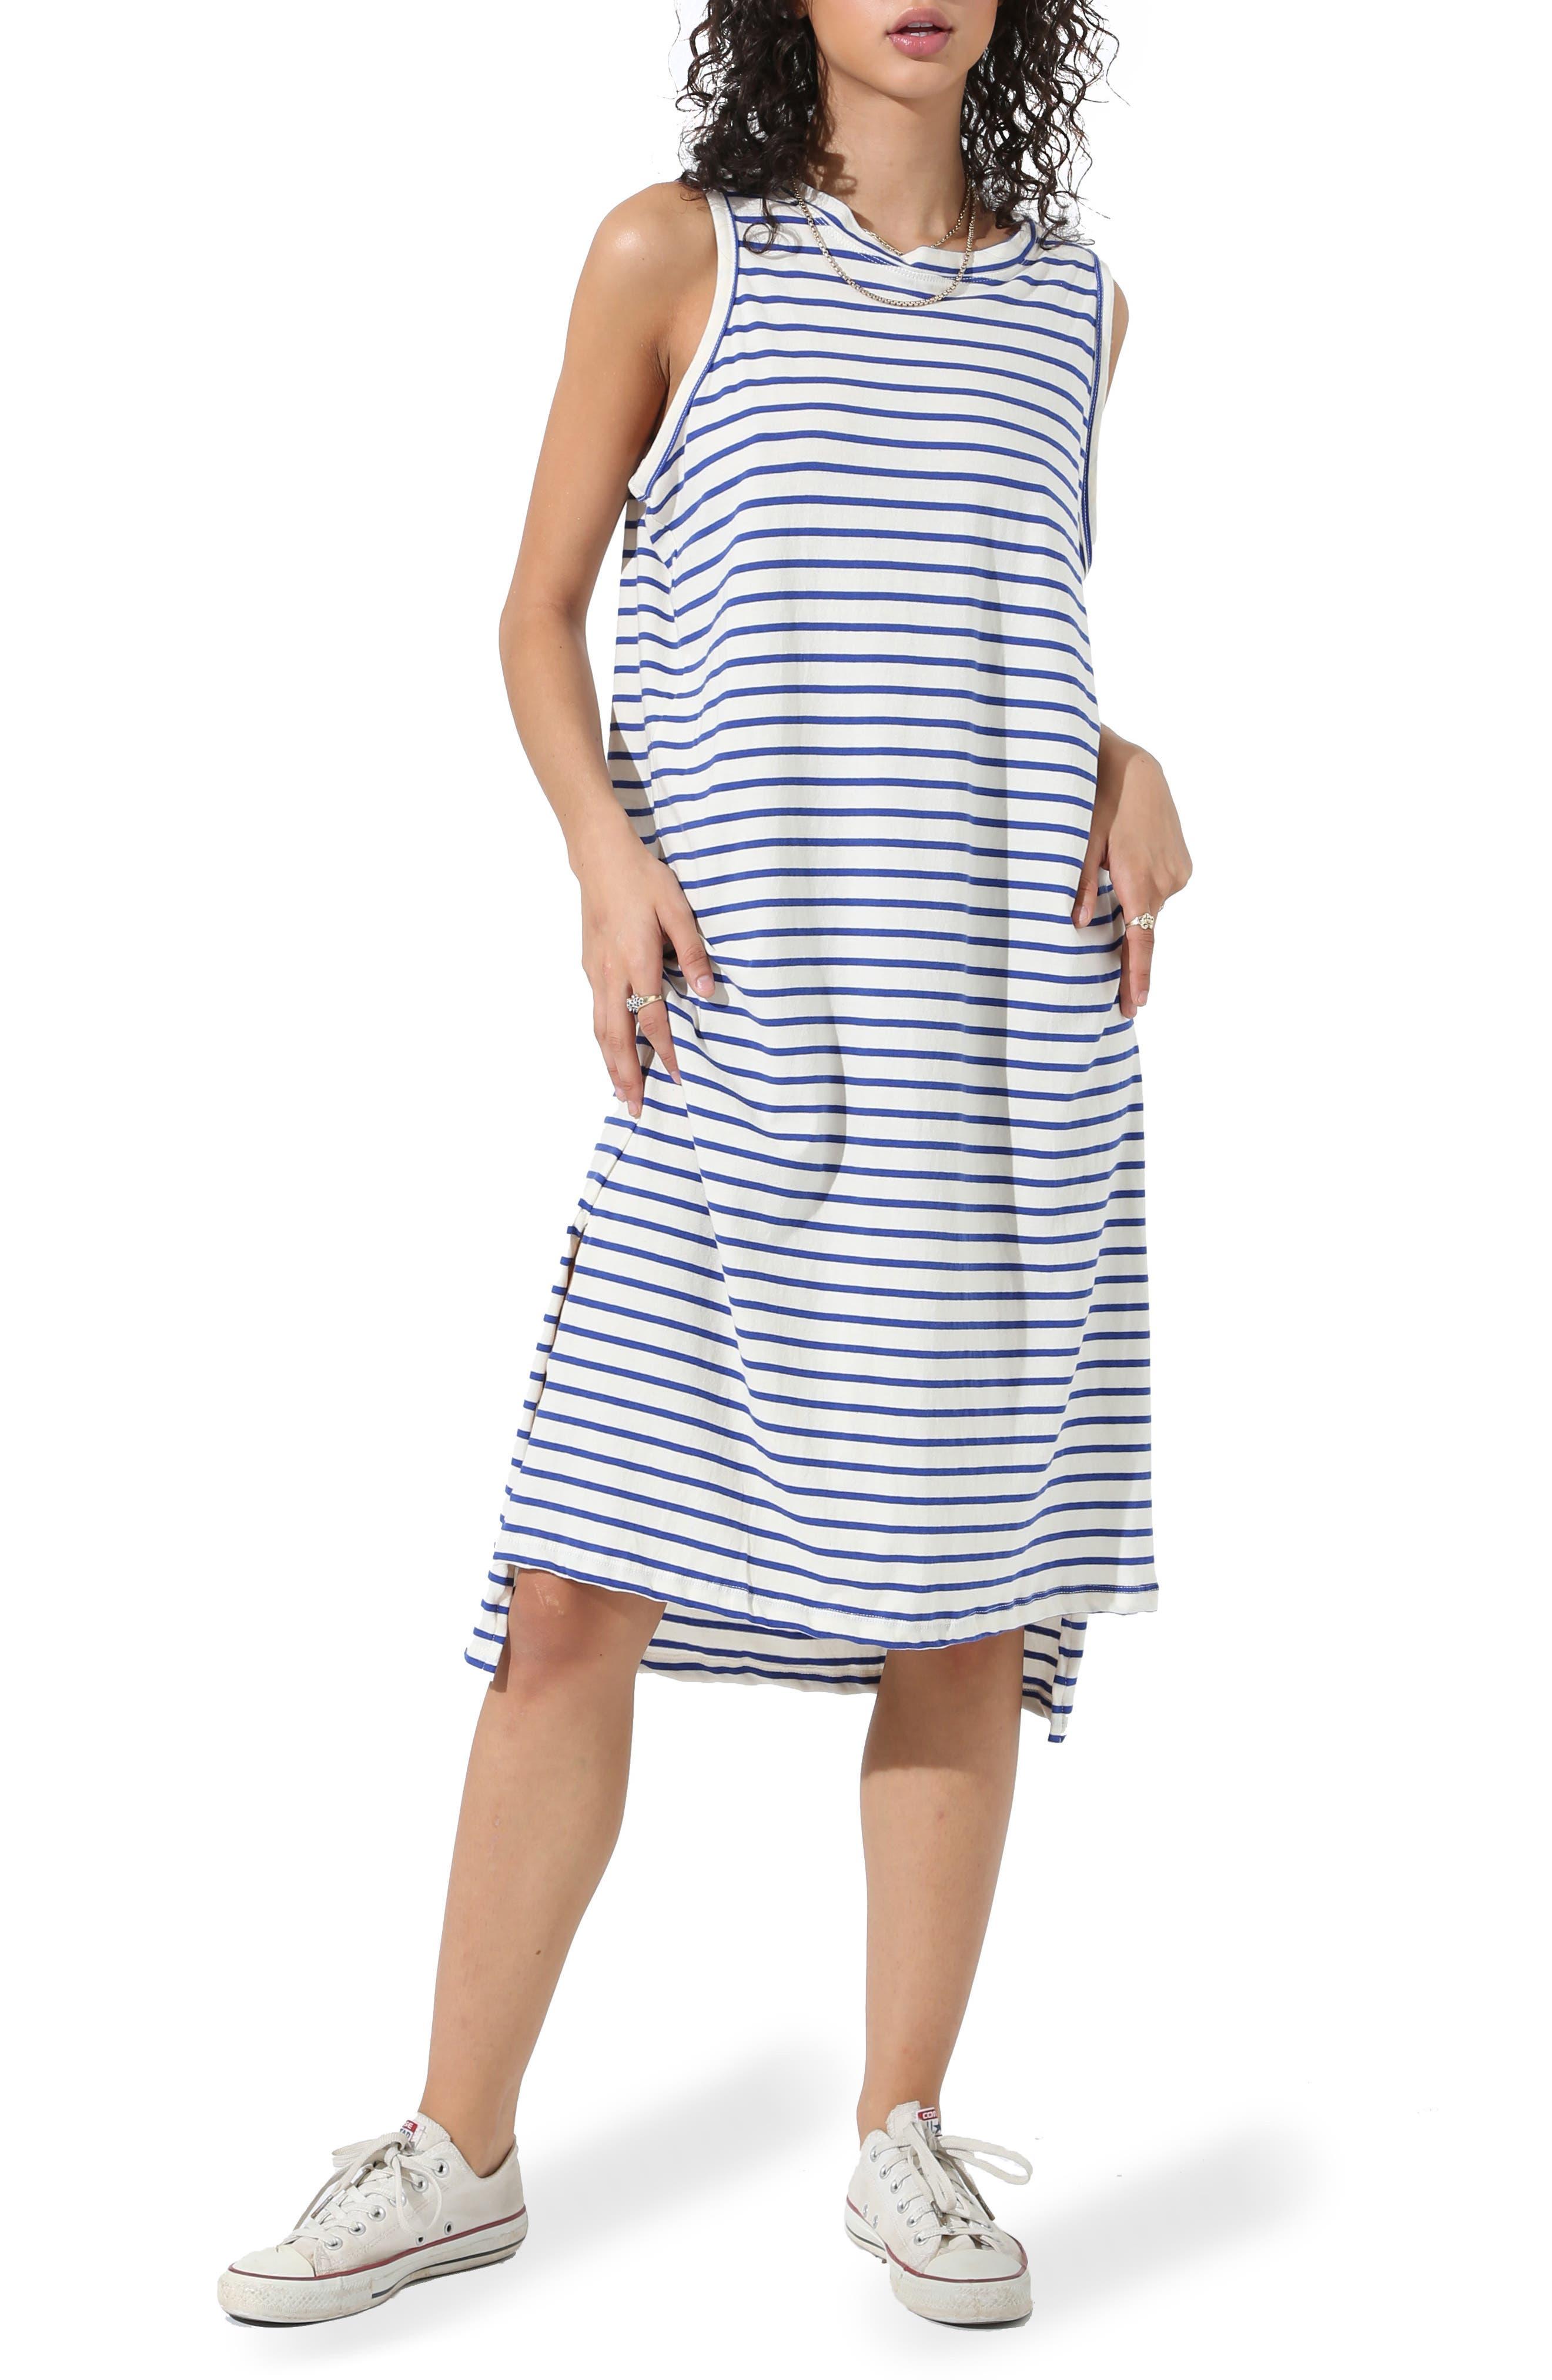 Posey Stripe Sleeveless Dress